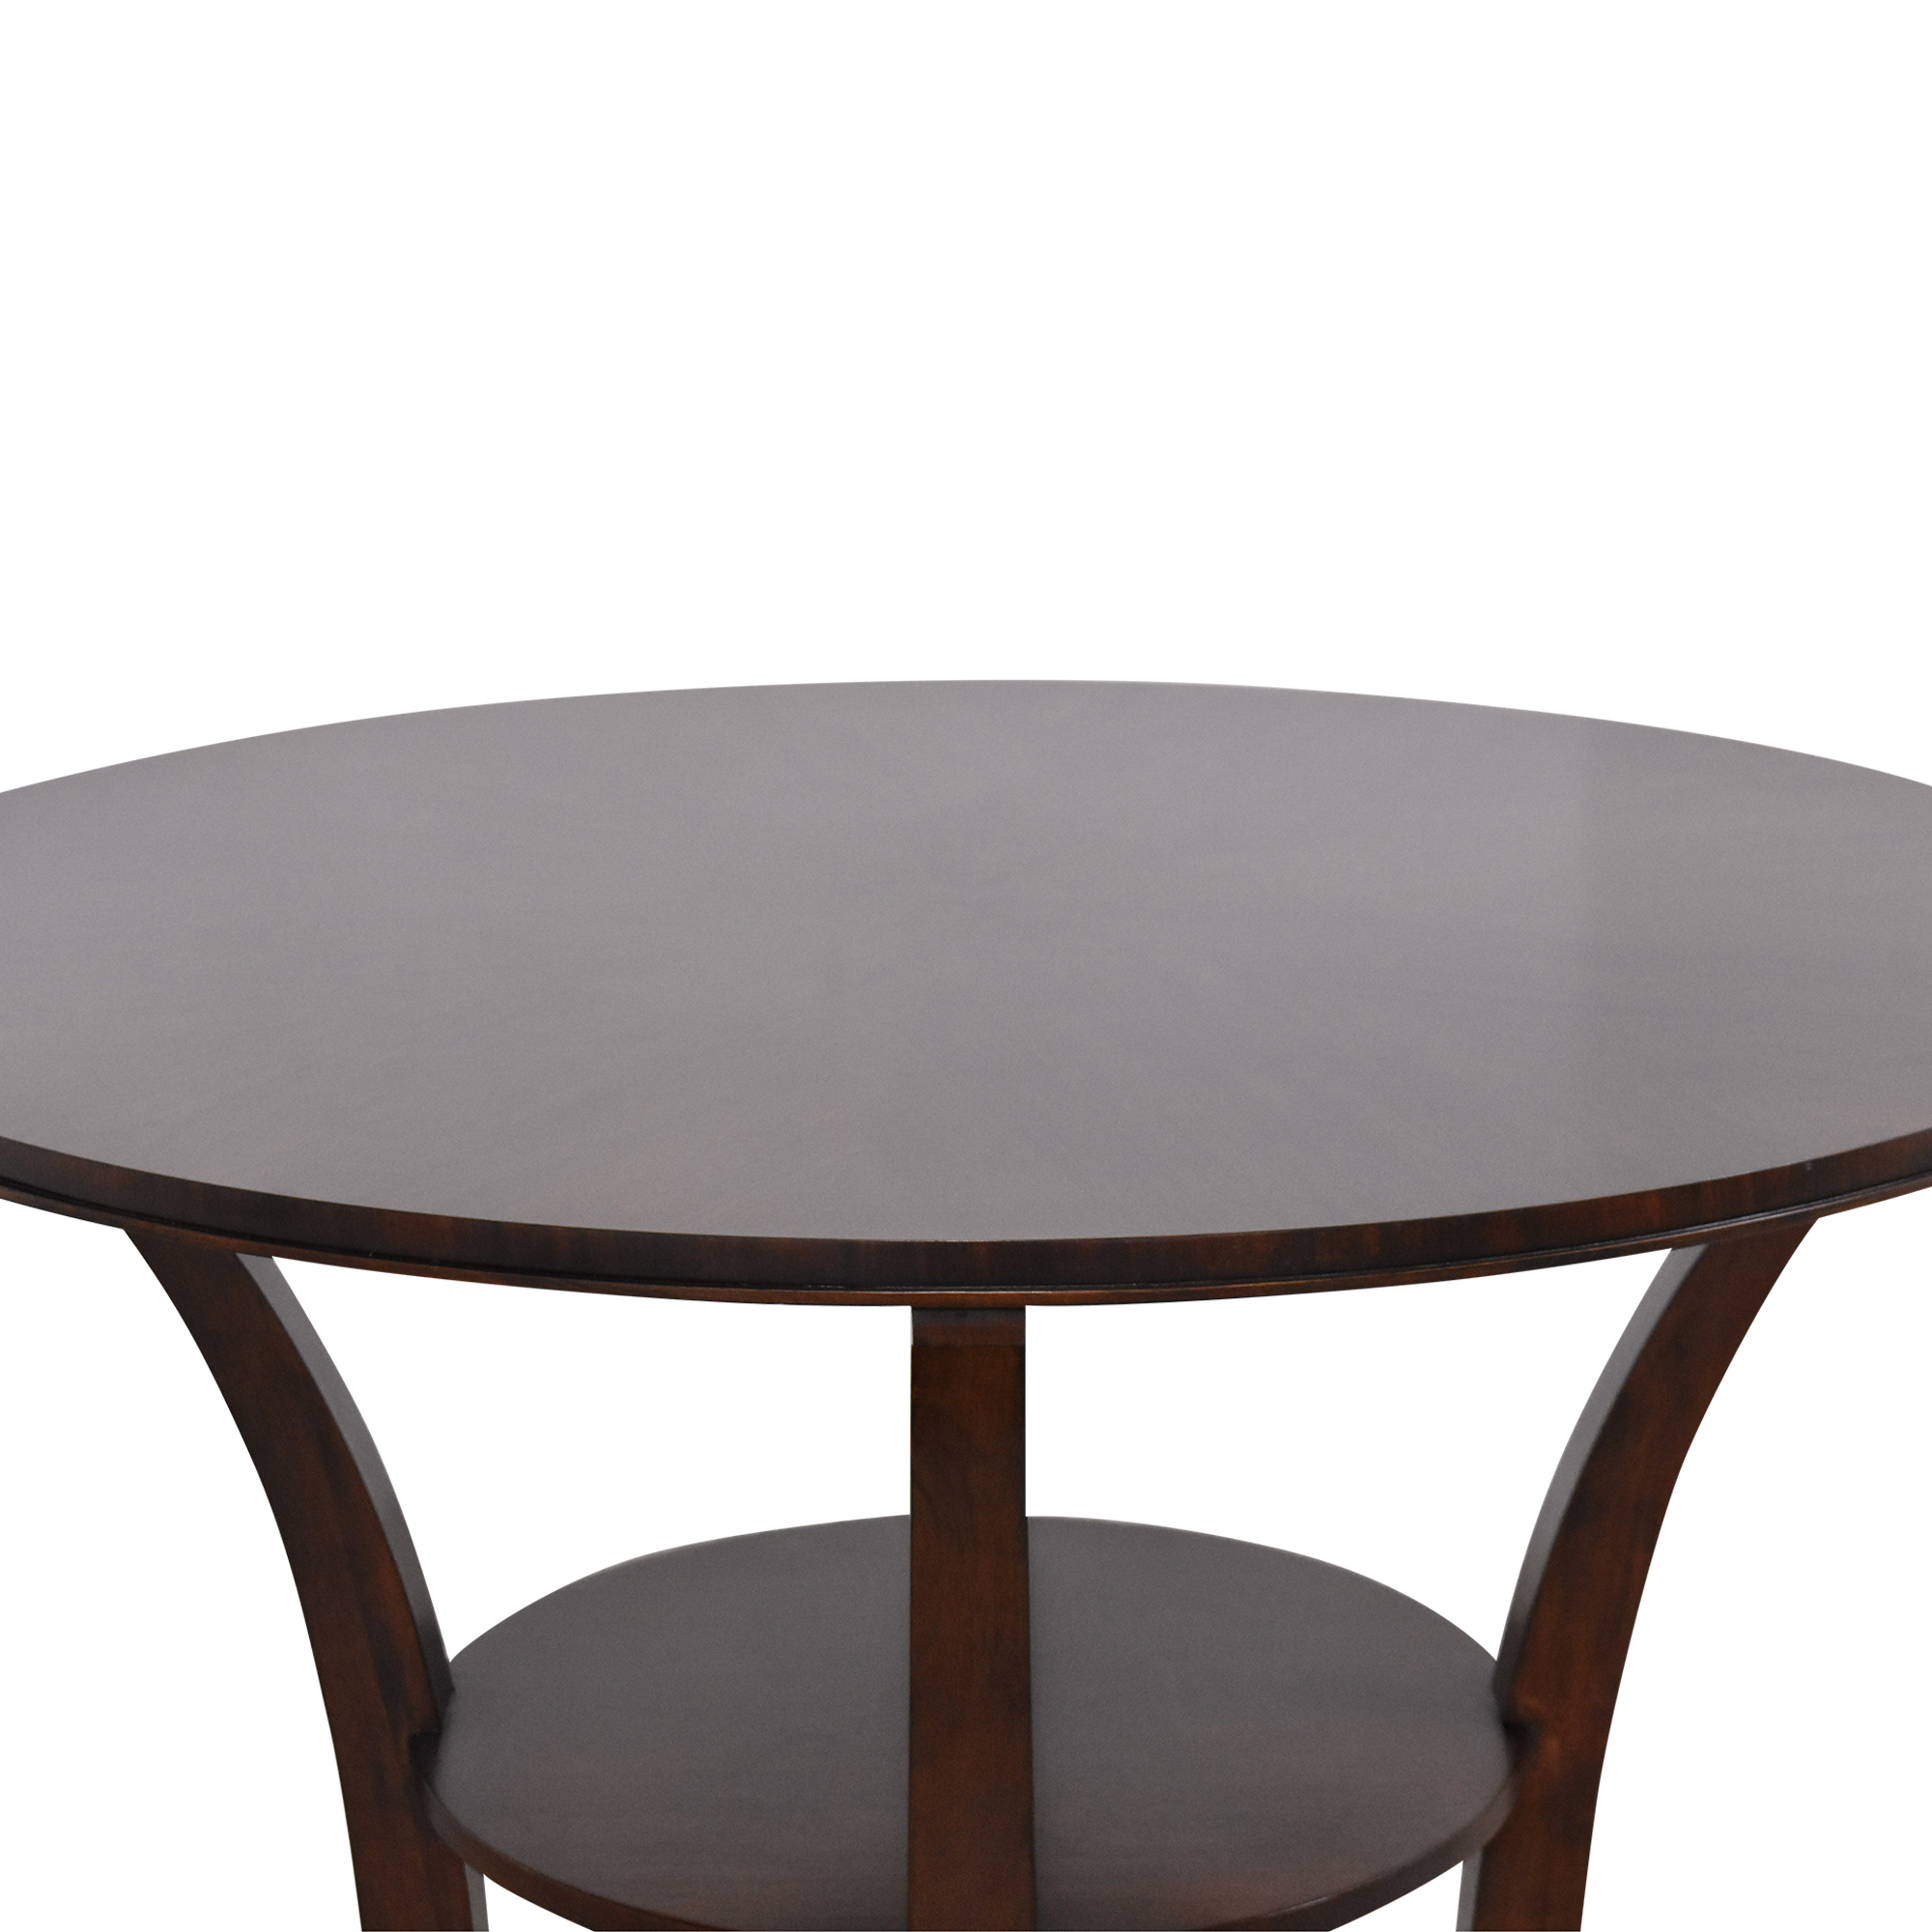 Hekman Furniture Hekman Metropolis Dining Table second hand